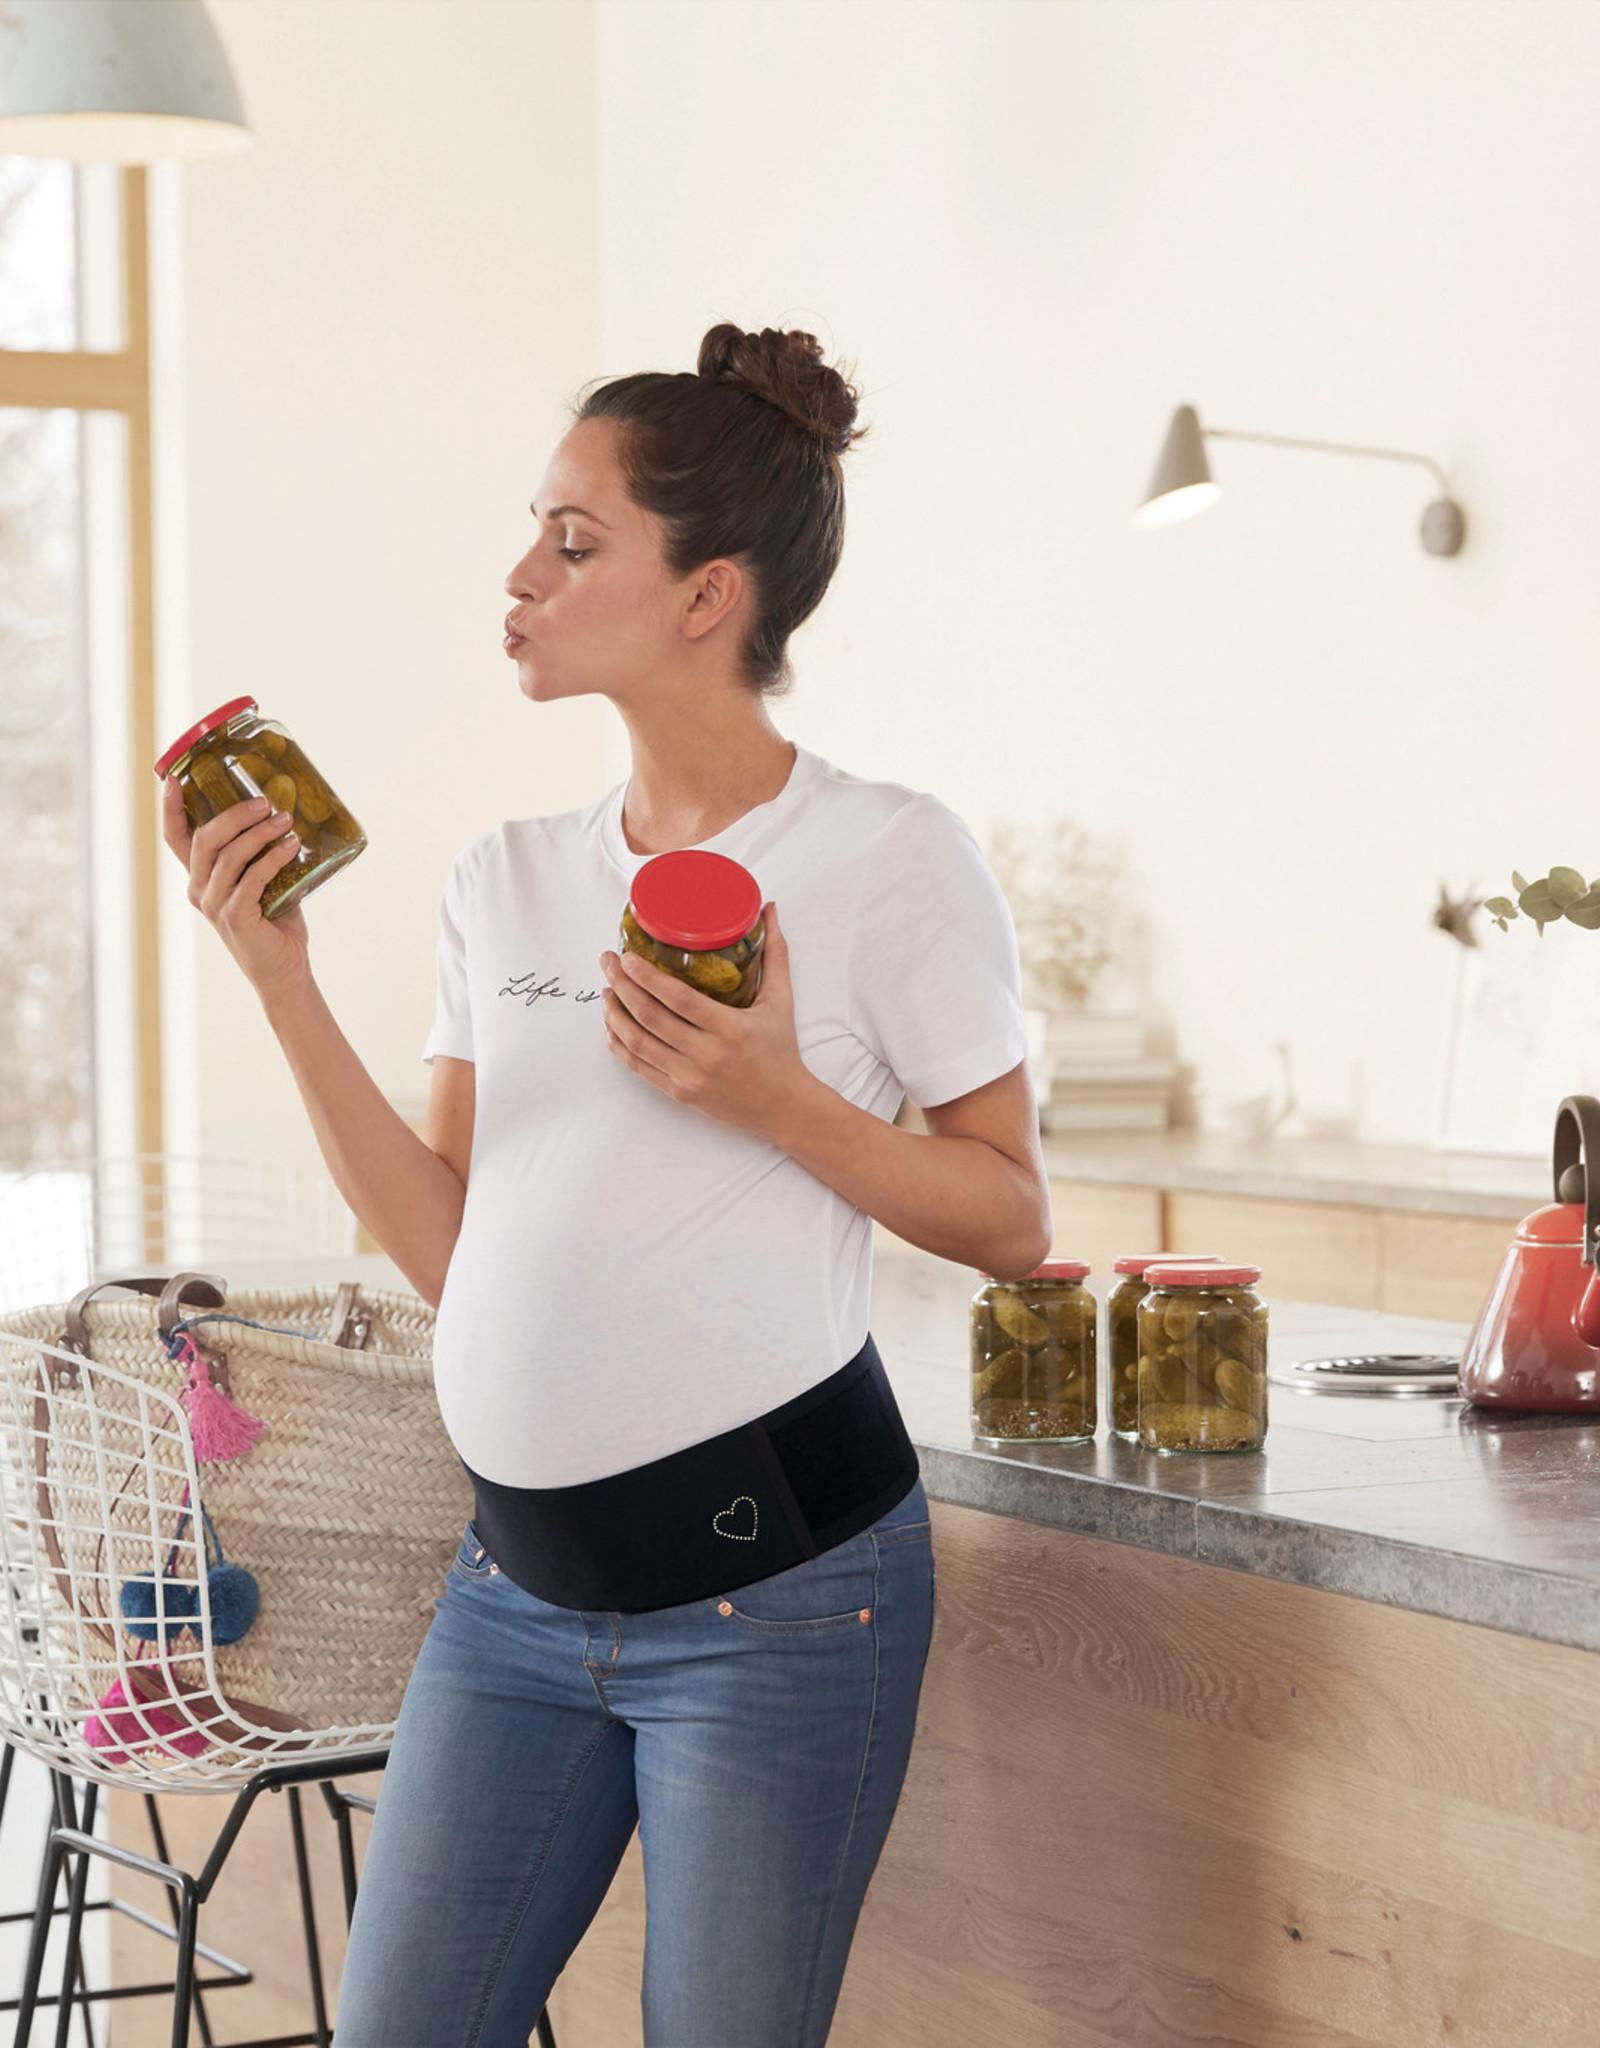 Anita Maternity BabySherpa - Zwangerschapssteunband